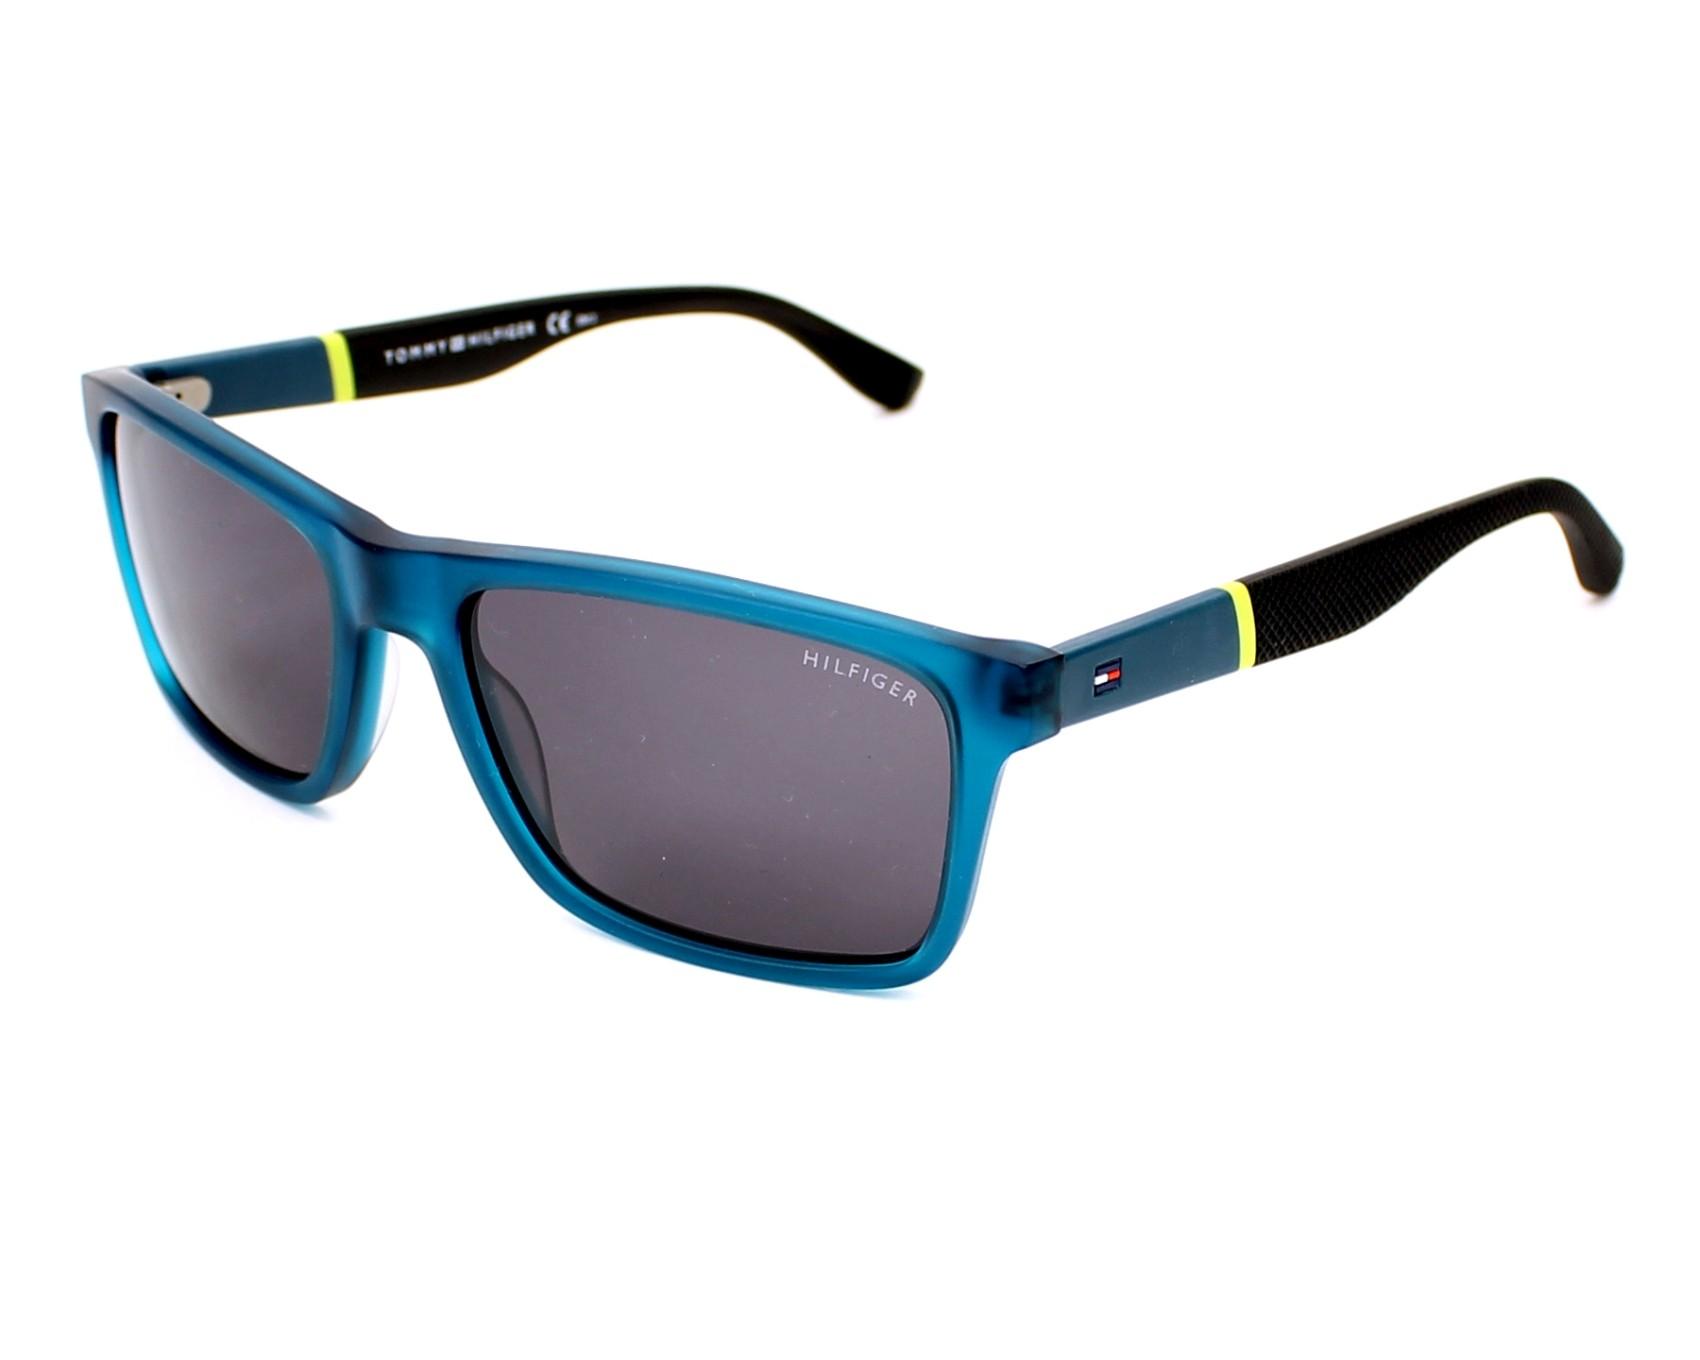 Sunglasses Rack Sunglasses Holder Glasses Display Stand